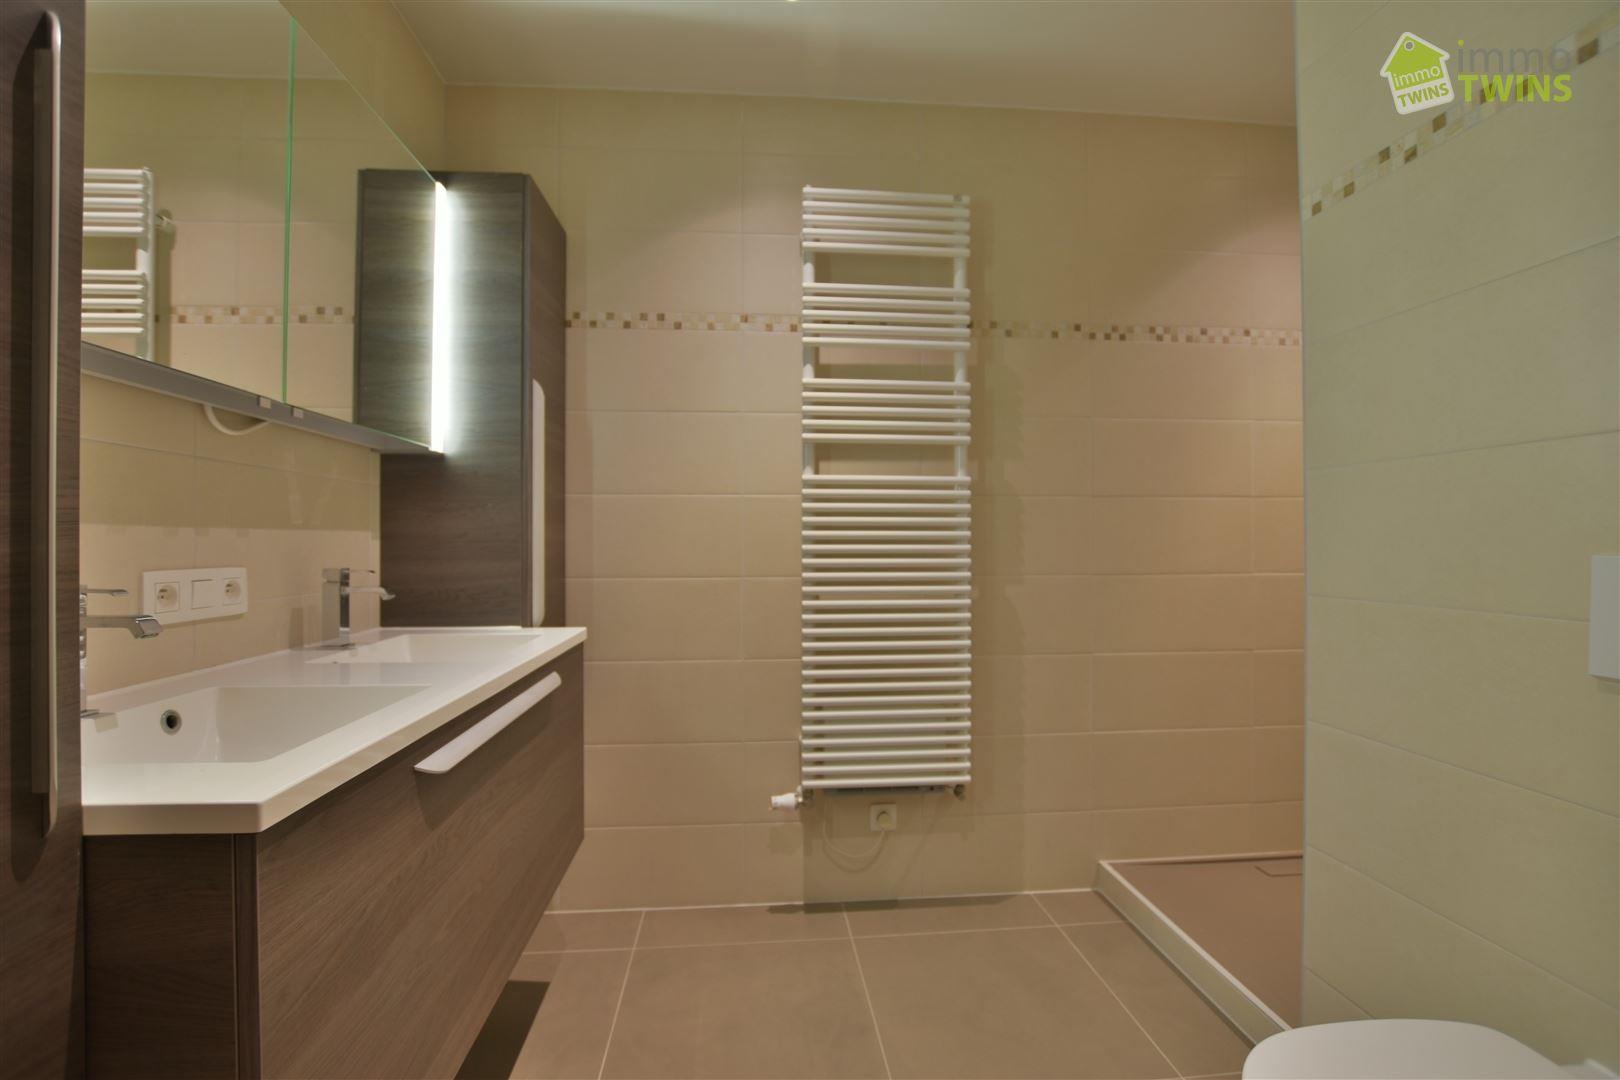 Foto 15 : Appartement te 9200 DENDERMONDE (België) - Prijs € 1.100